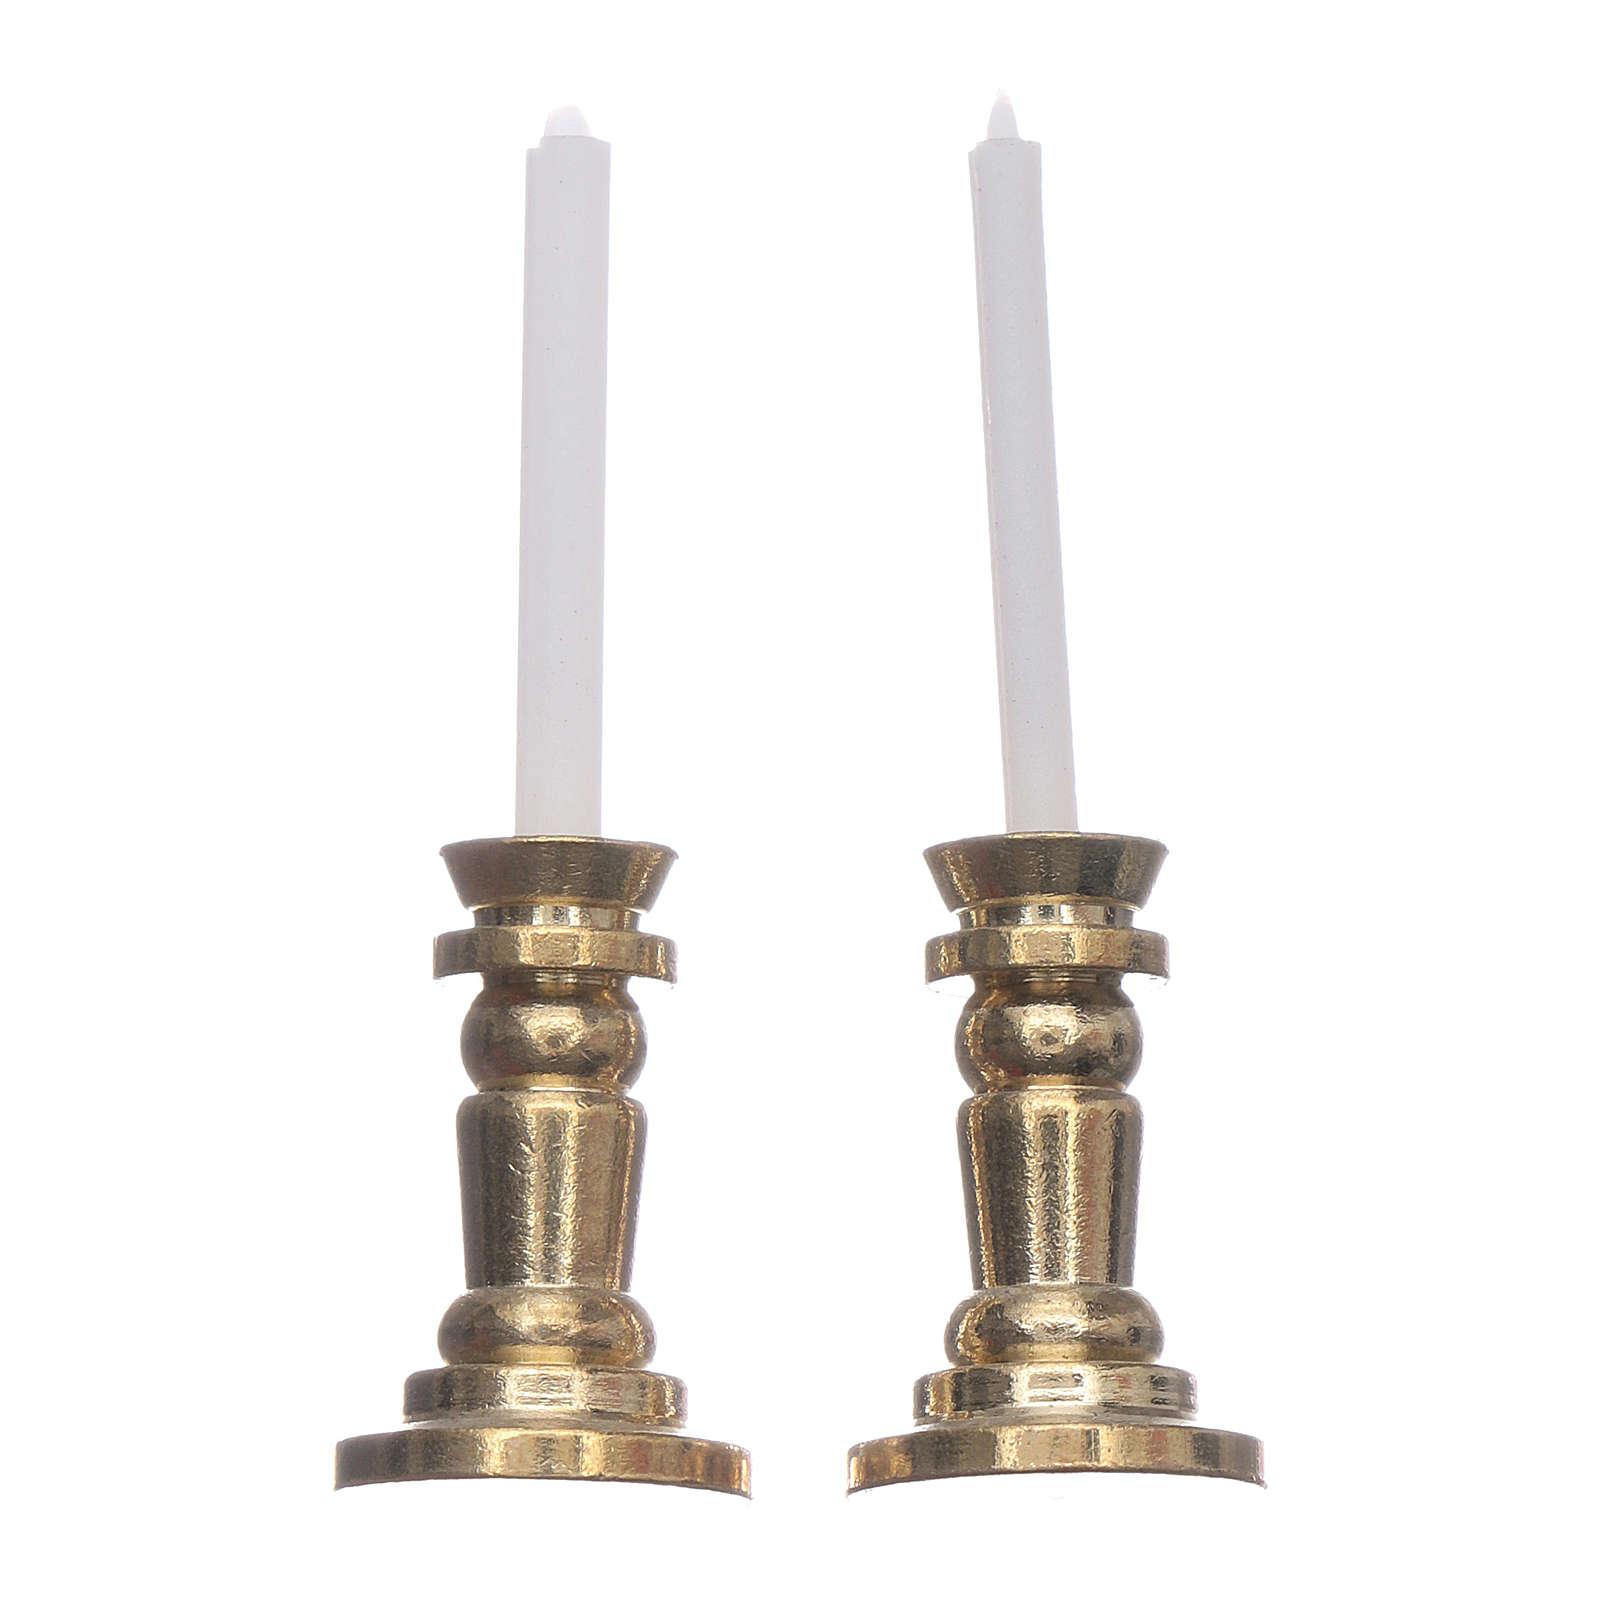 Nativity scene candle holder pair 3,5 cm 4